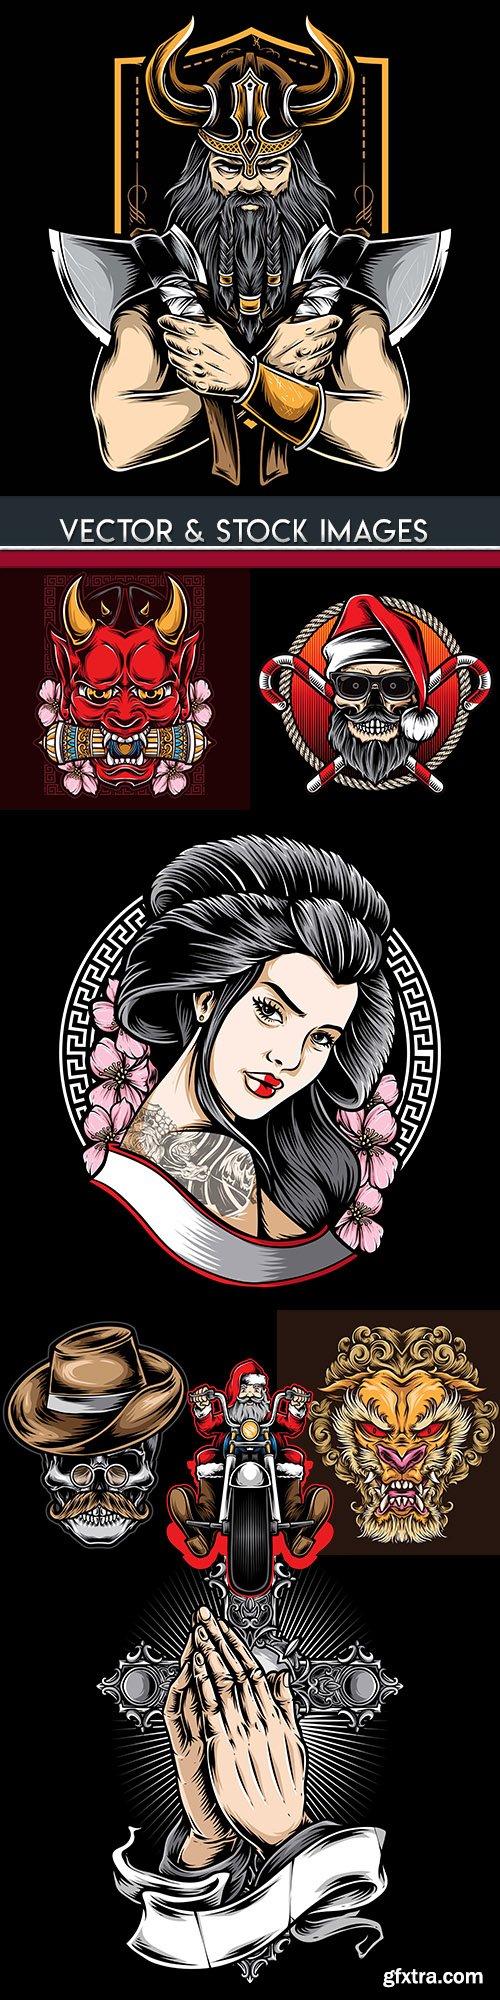 Tattoo and logo cartoon drawing design illuminations